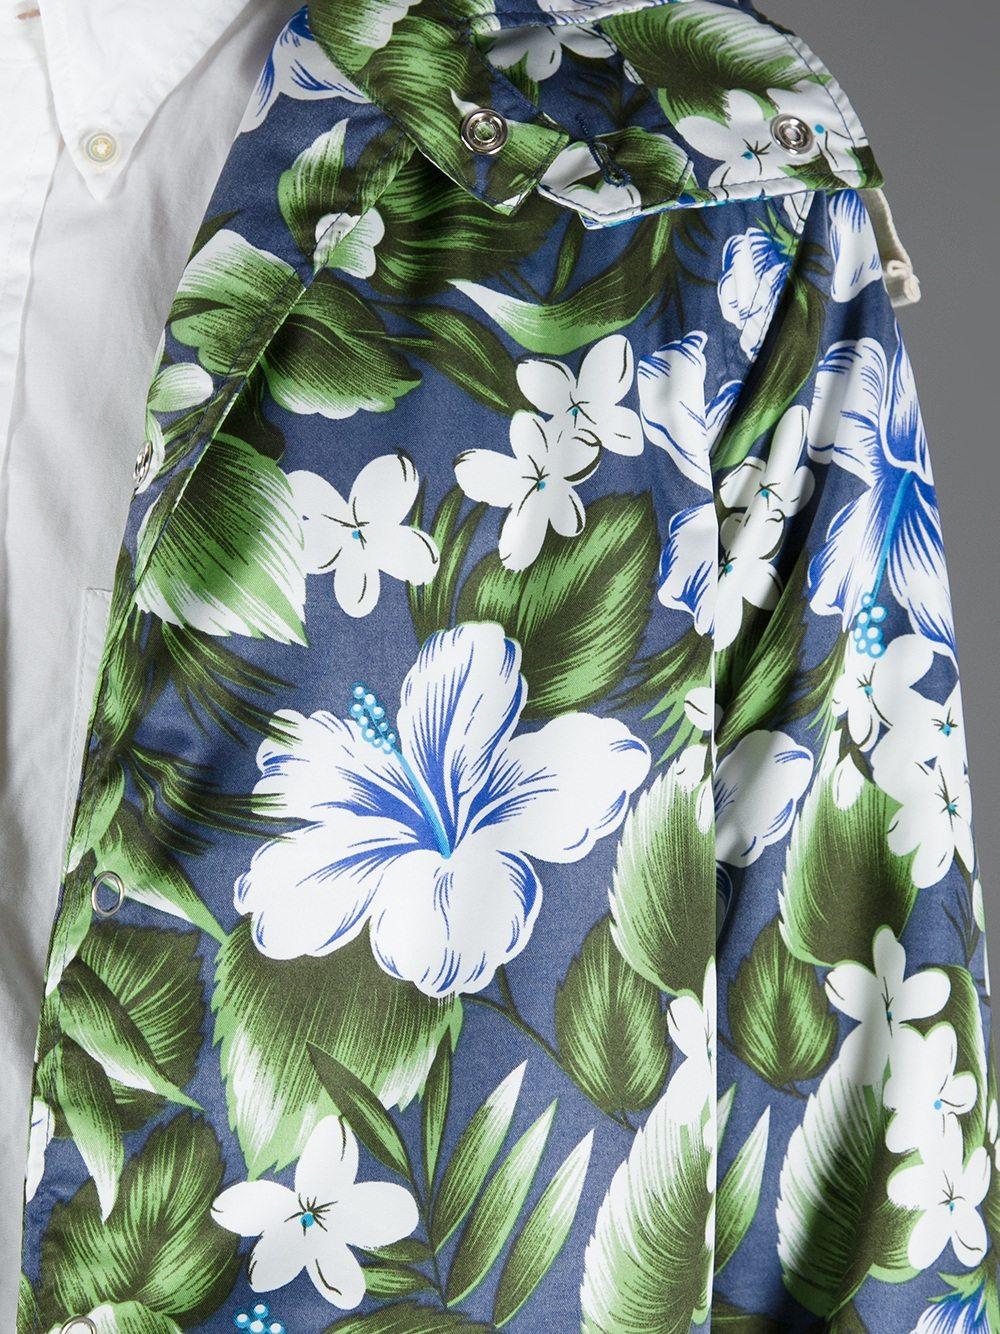 Hawaiian-Print-Hooded-Jacket-Engineered-Floral-Print-FarFetch-Close